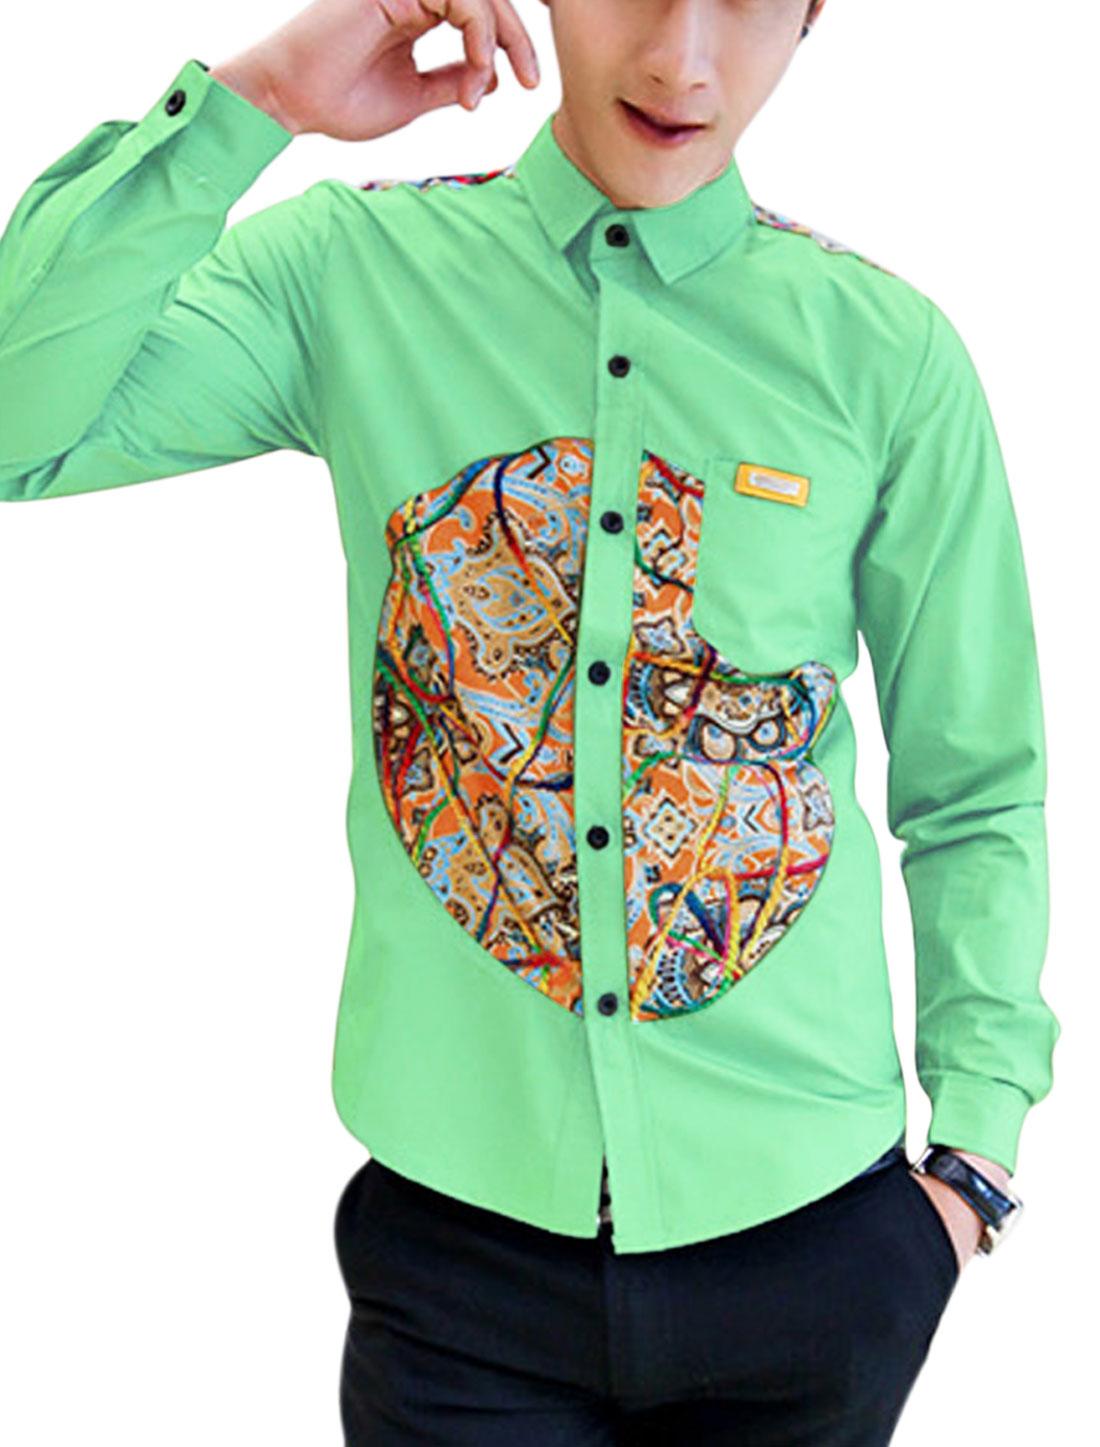 Men Casual Contrast Novelty Print Embroidery Decor Buttoned Cuffs Shirt Light Green M